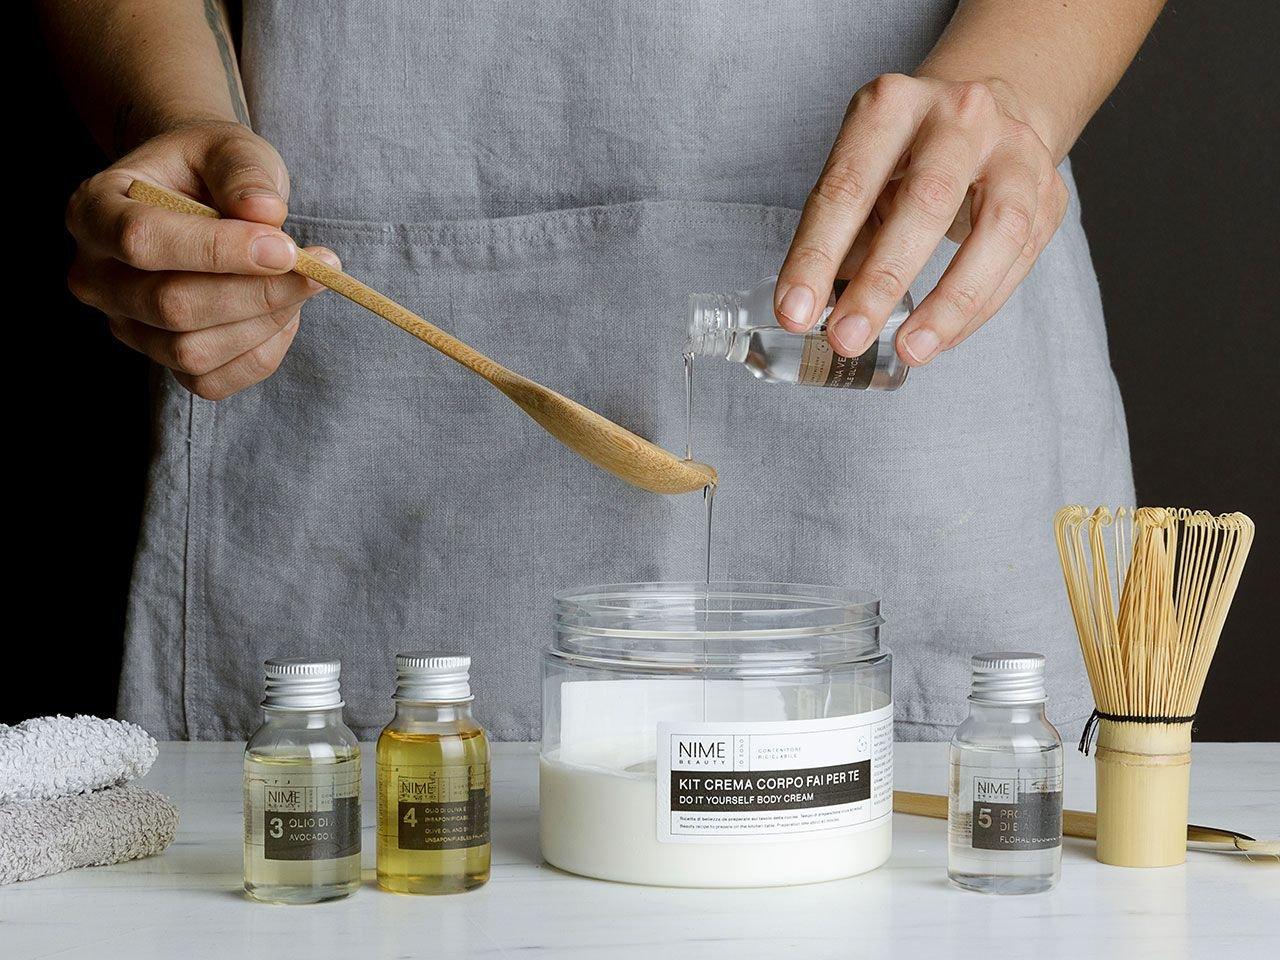 Kit Crema corpo fai per te - v3